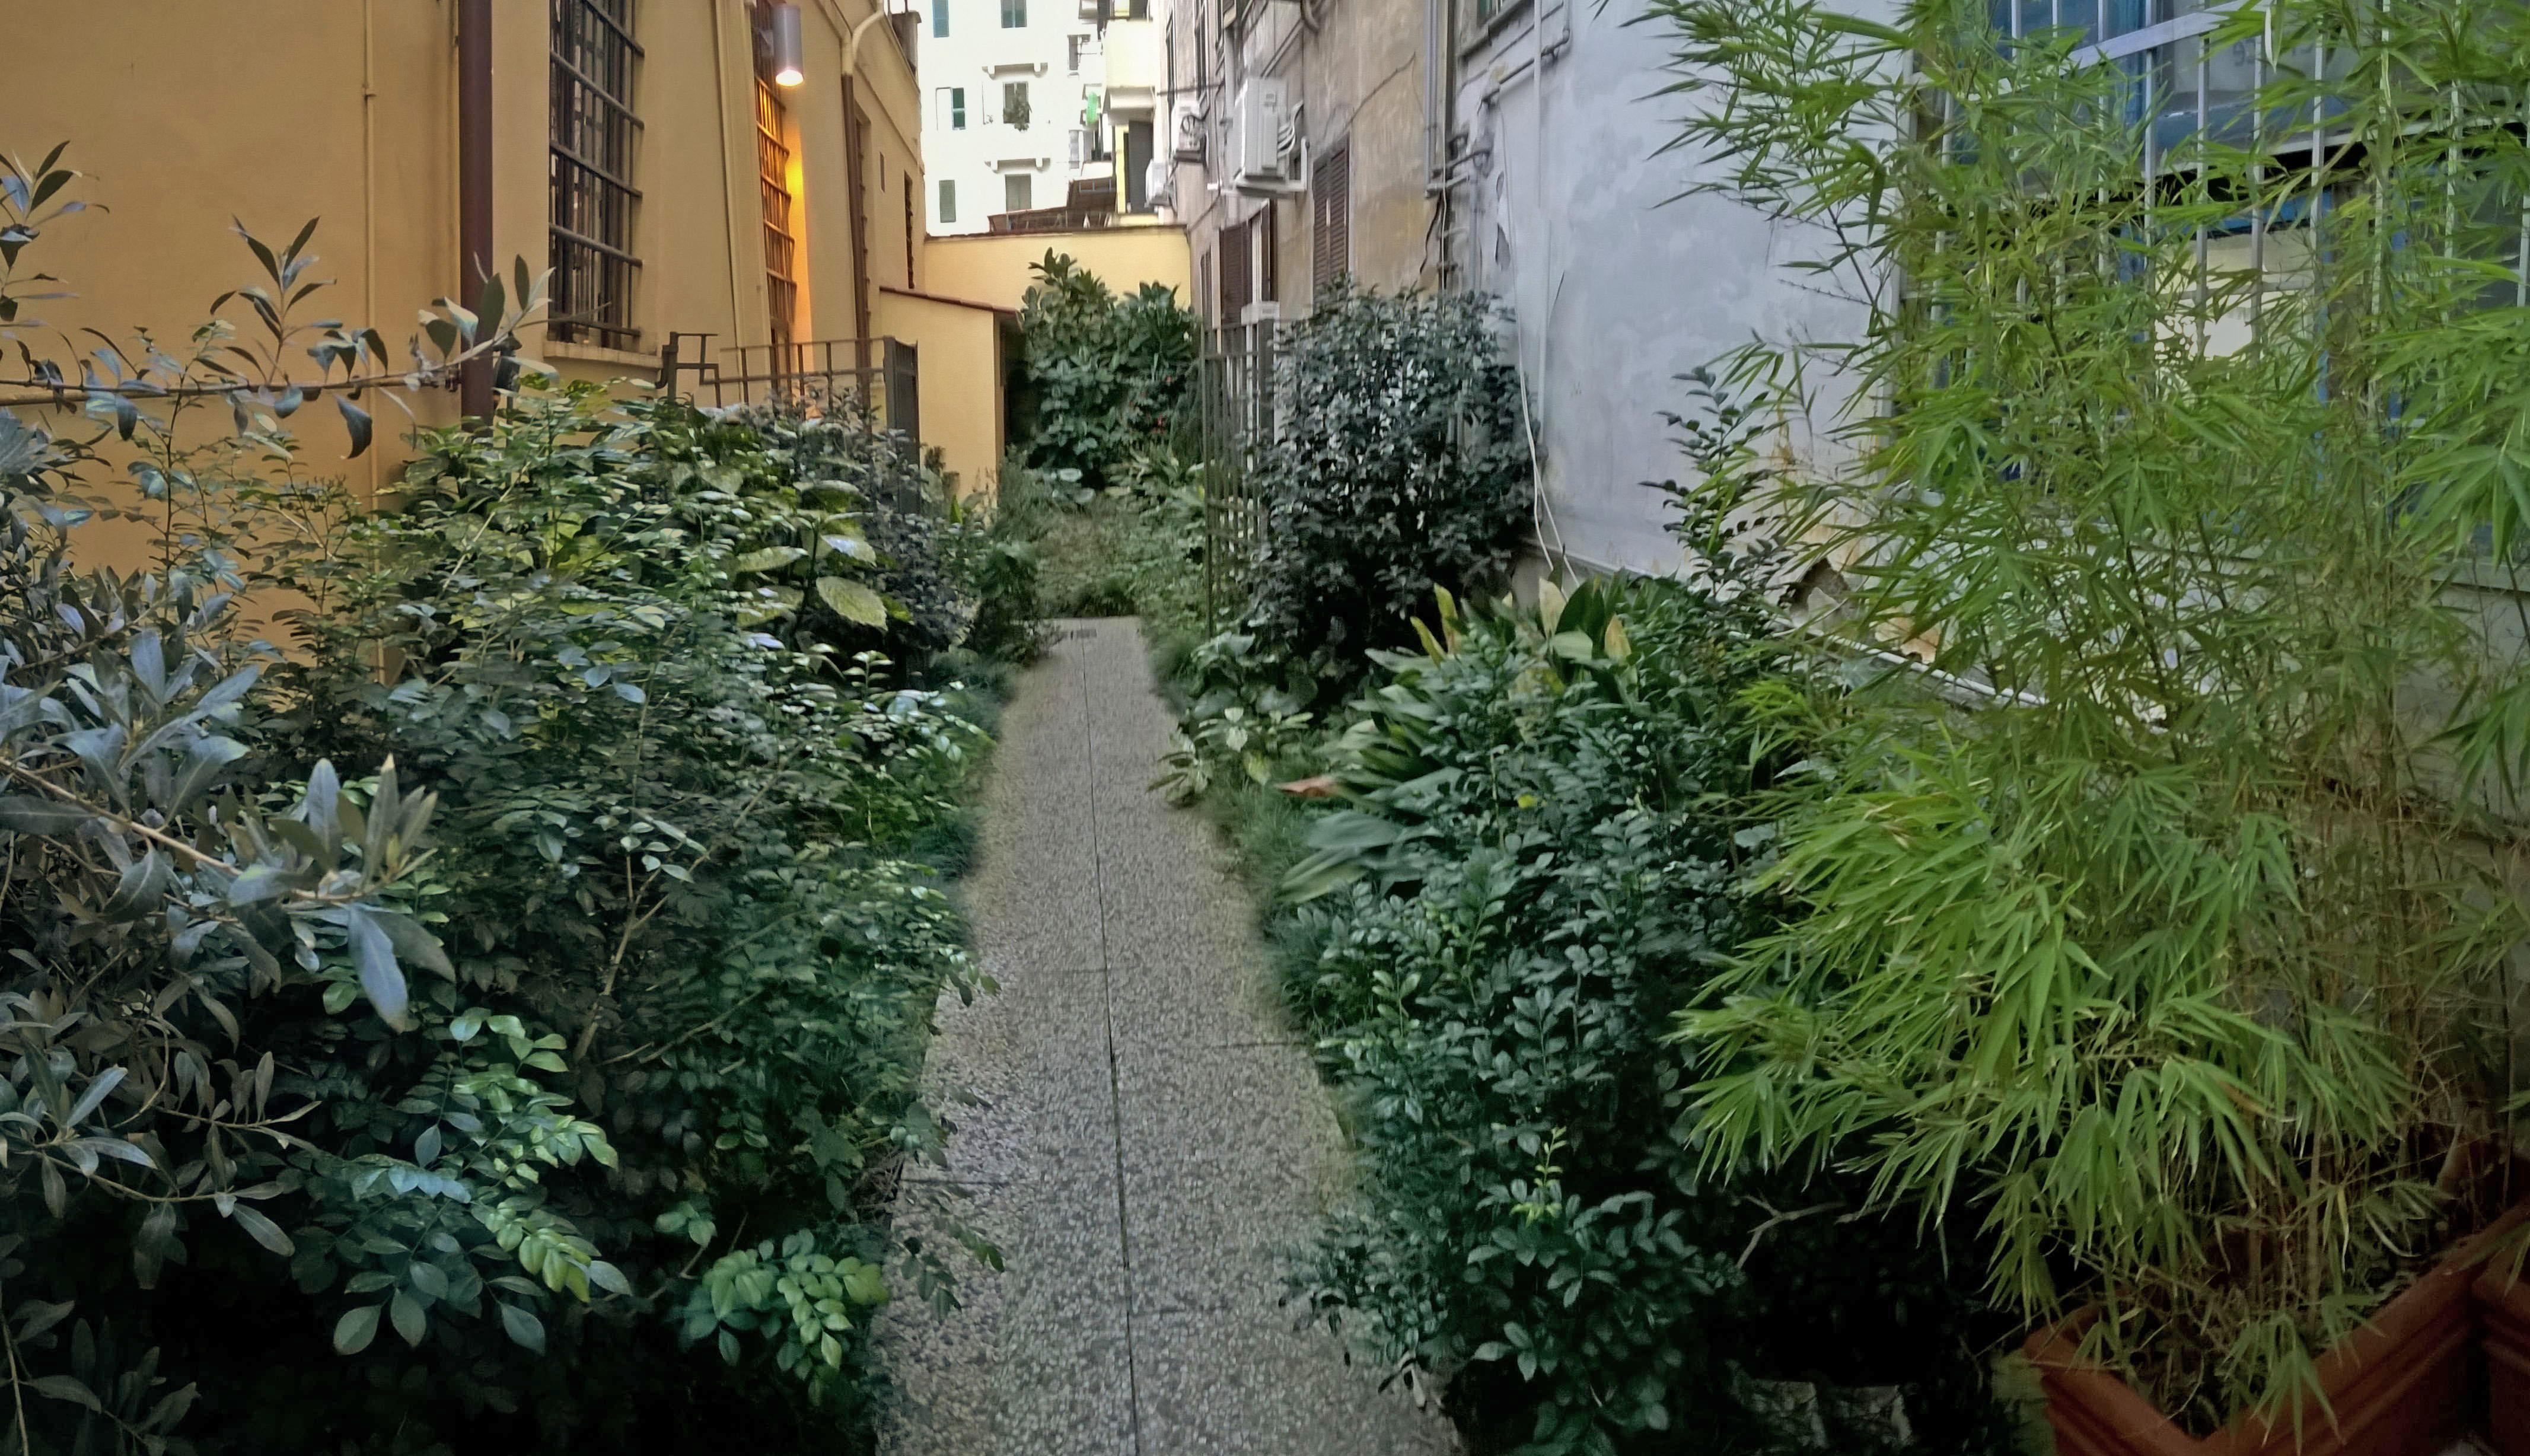 Giardino ombra luminosa idee per interni e mobili - Giardino in ombra ...